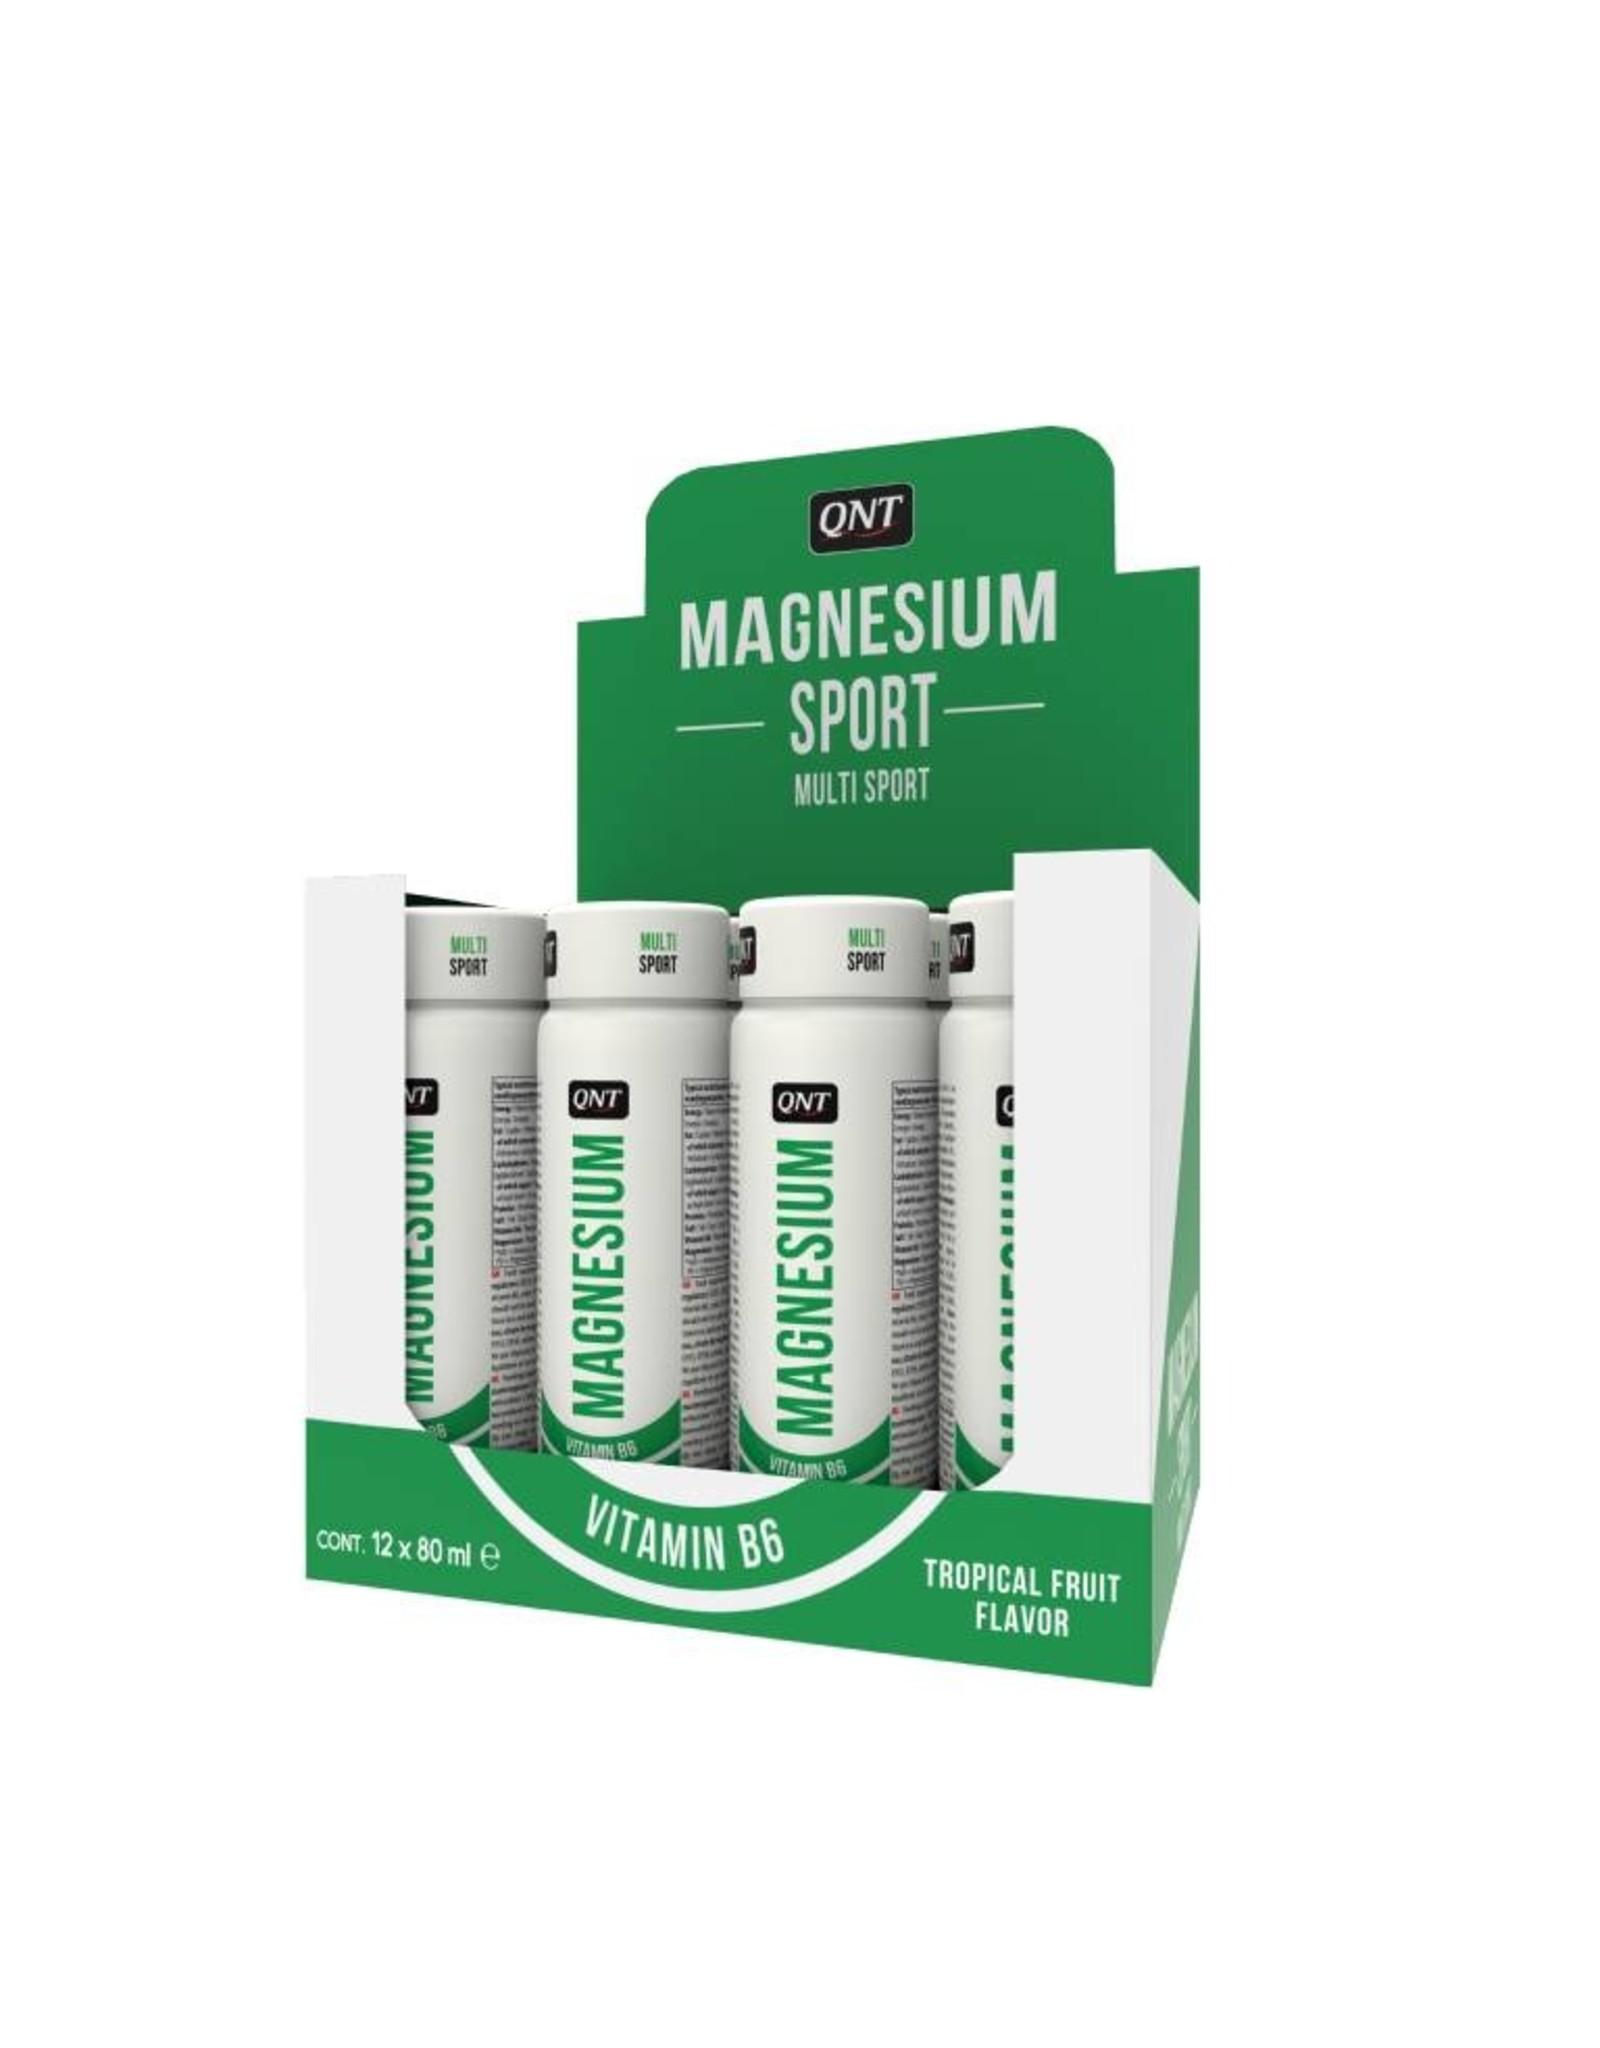 QNT Magnesium shot - 12 x 80 ml